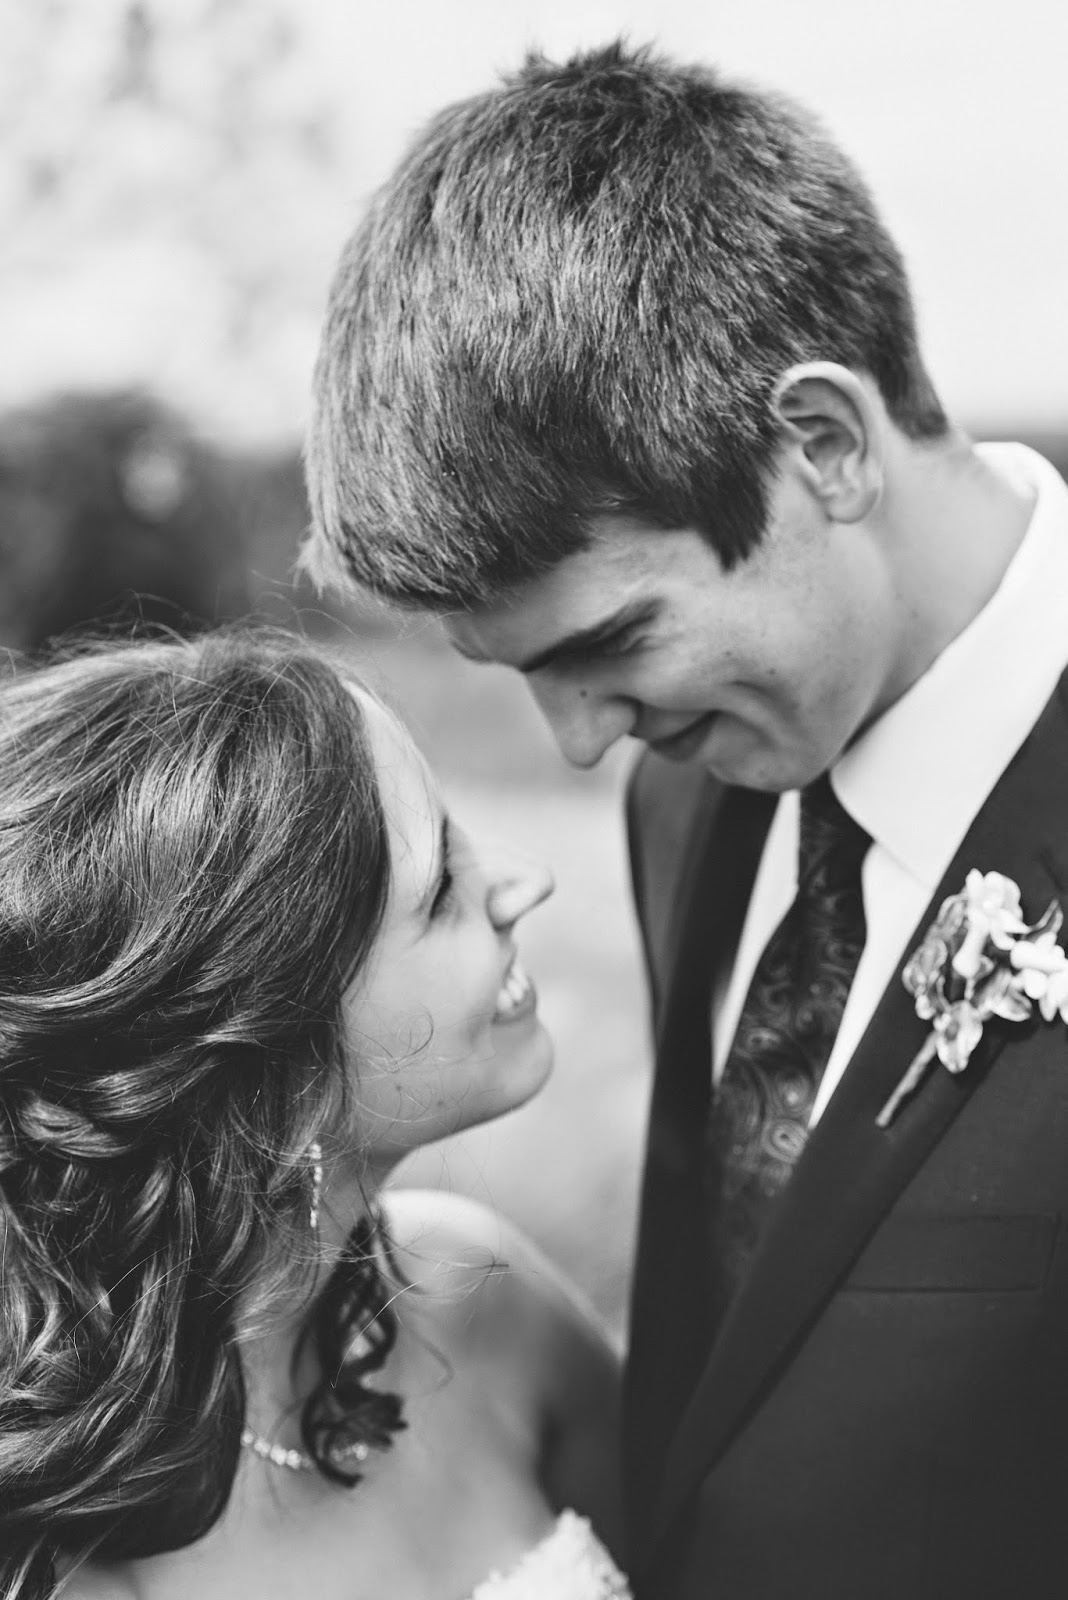 husband 22nd birthday, beautiful black and white wedding photo, happiness